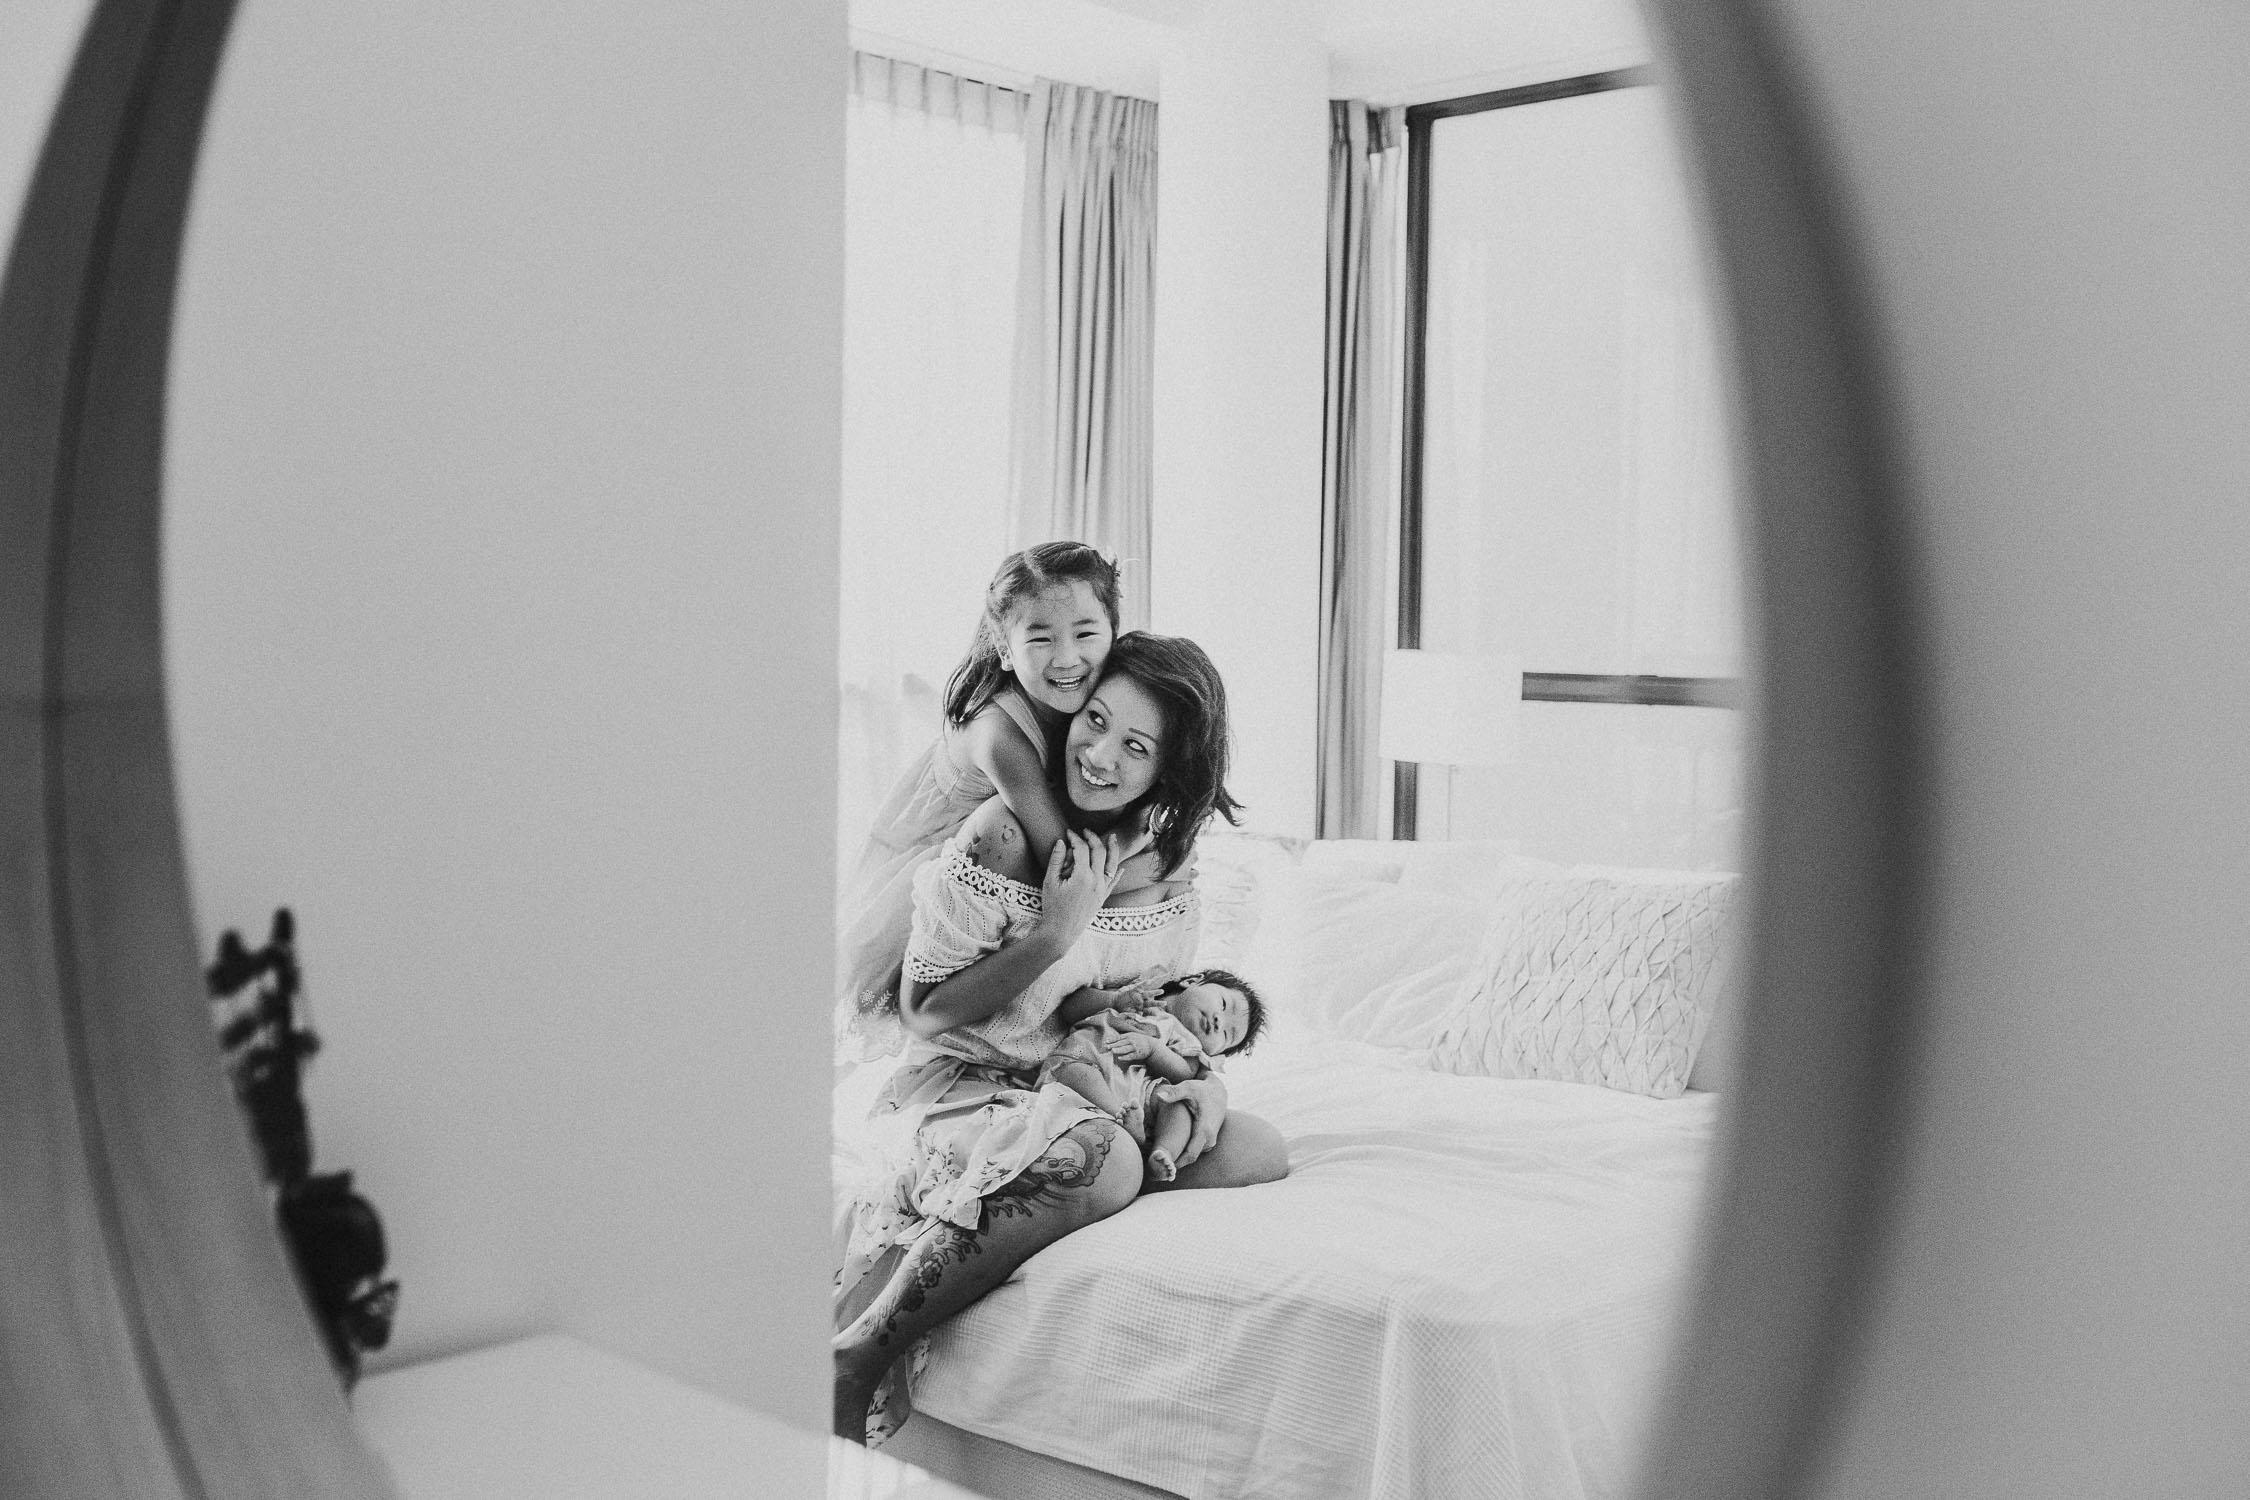 julia_whale_photography_newbornphotography-16.jpg